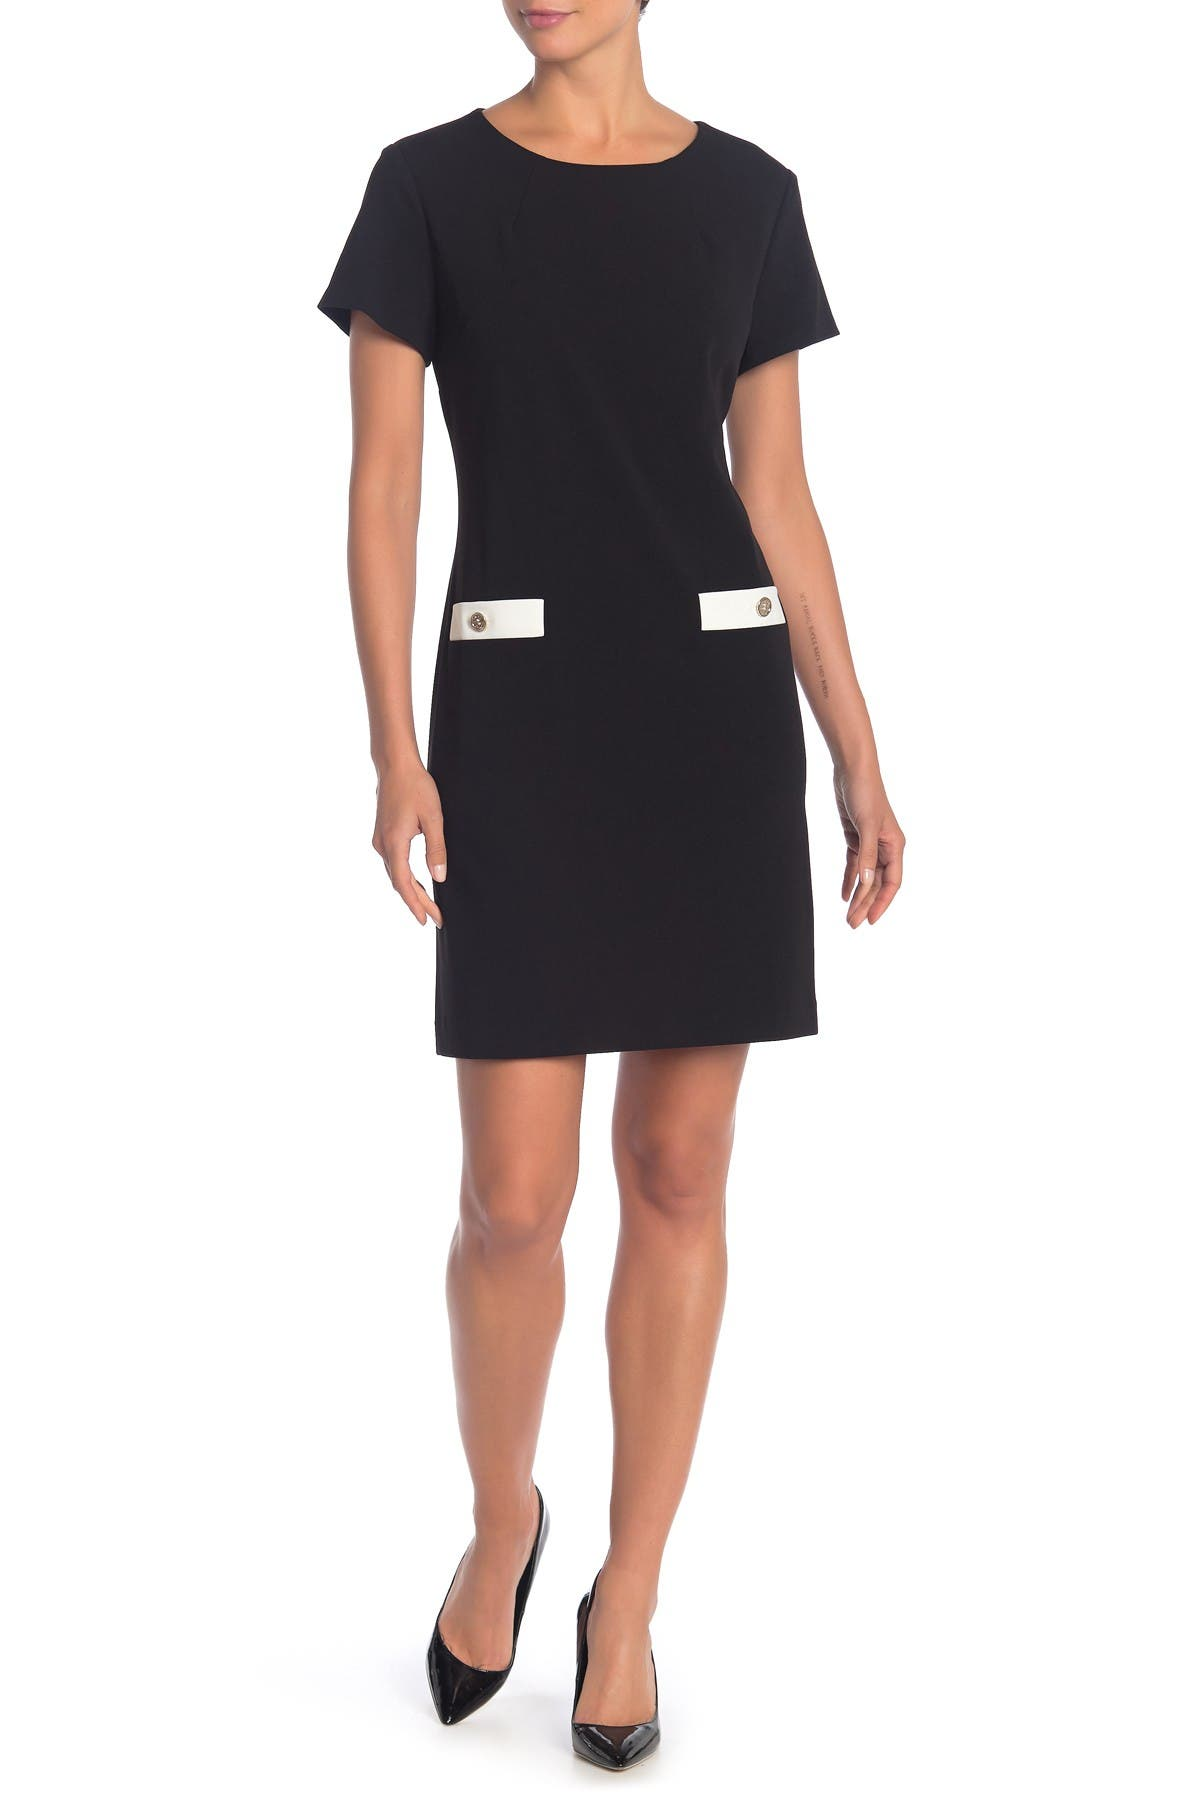 Image of Tommy Hilfiger Crew Neck Short Sleeve Dress